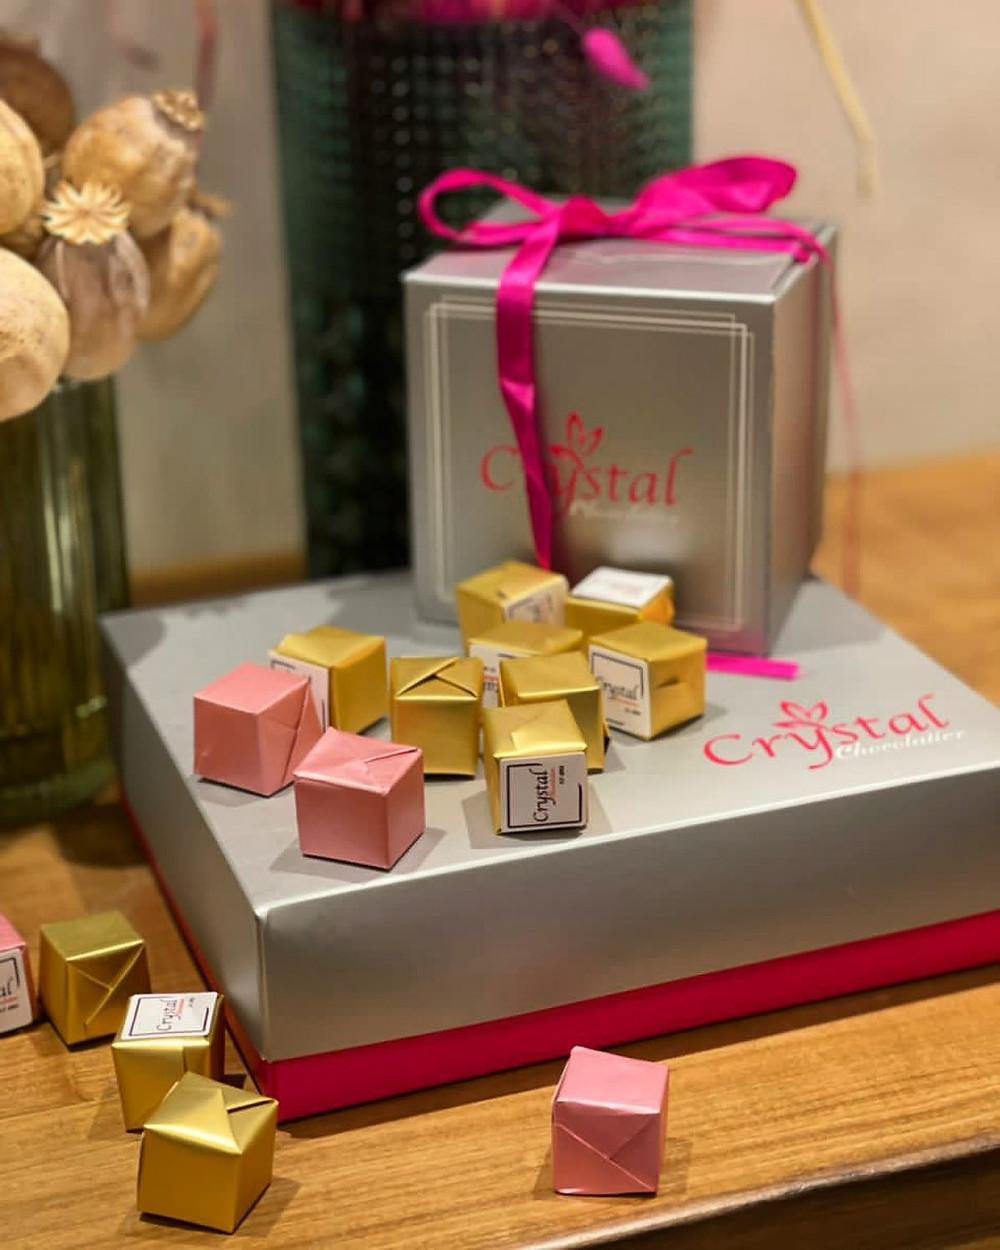 crystal chocolatier